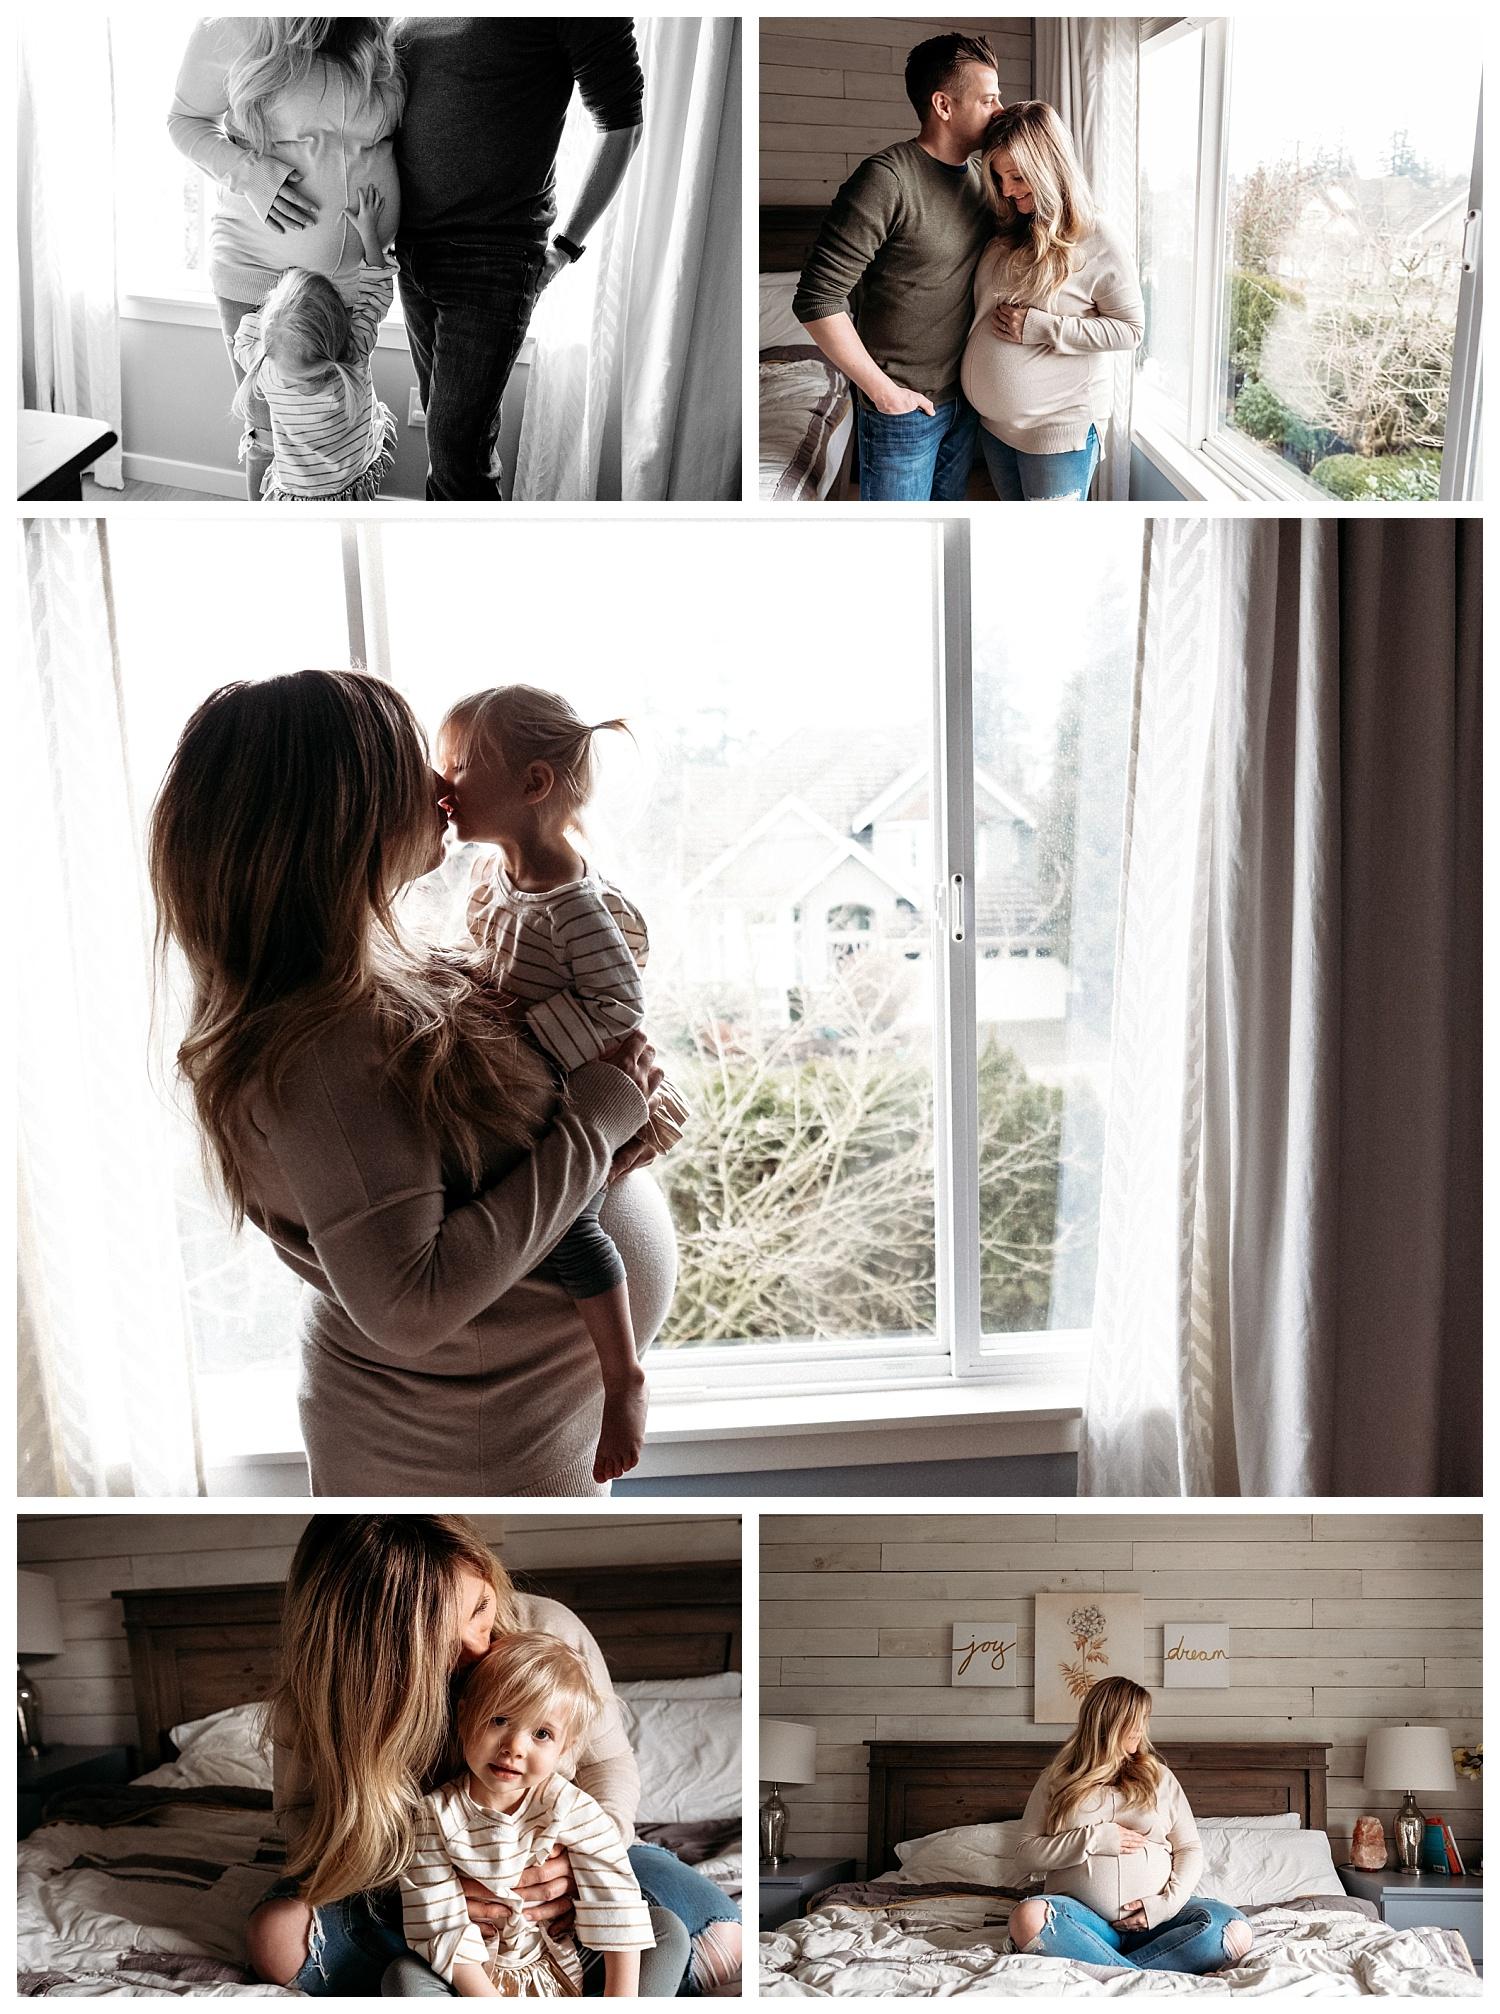 lifestyle-maternity-session-toddler-windows-indoors.jpg